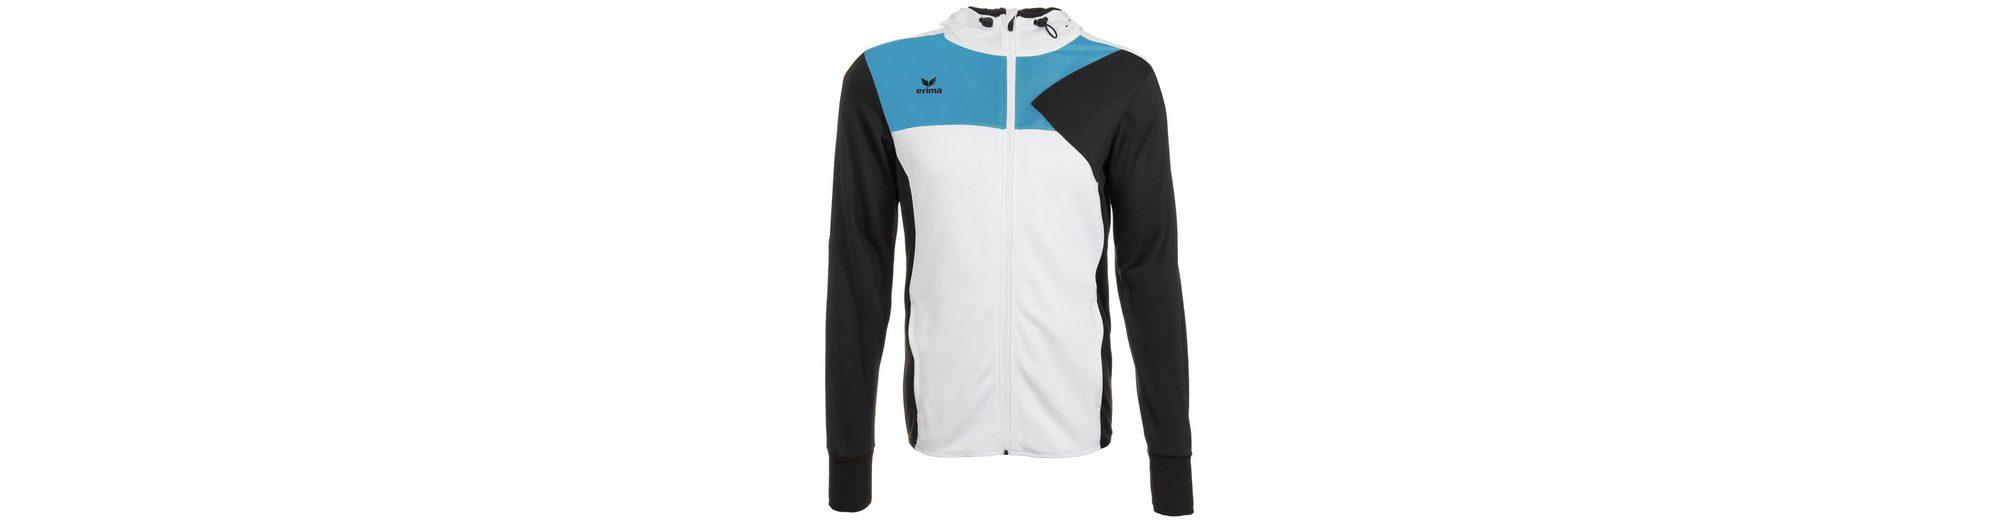 ERIMA Premium One Trainingsjacke mit Kapuze Herren Neuester Günstiger Preis lJhkEYM